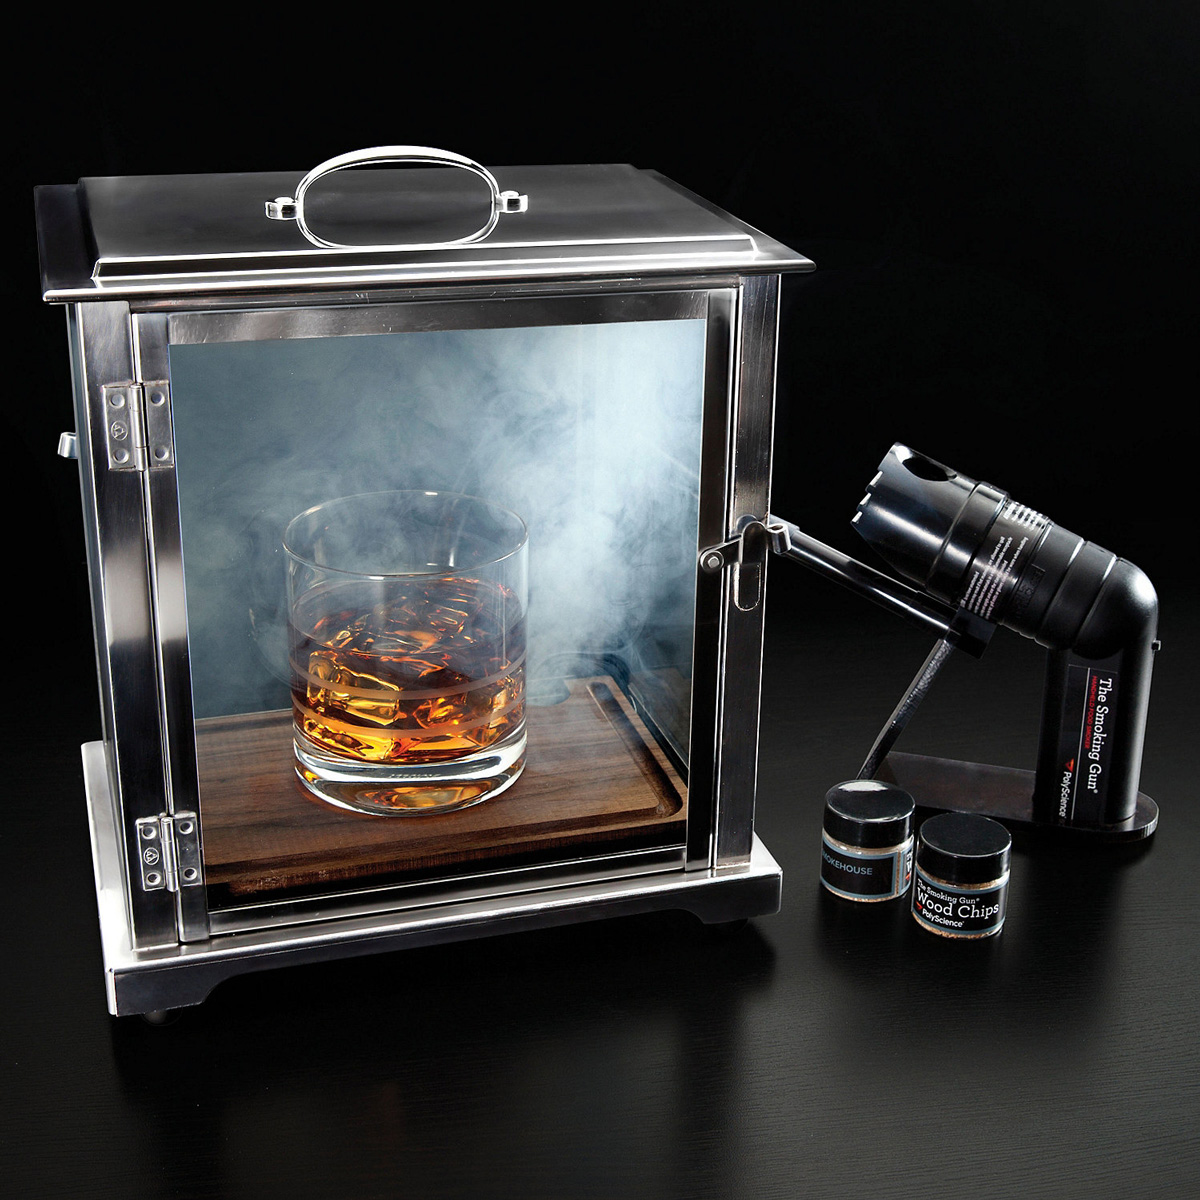 Christmas Home Decor Catalogs Crafthouse Cocktail Smoking Box With Smoke Gun The Green